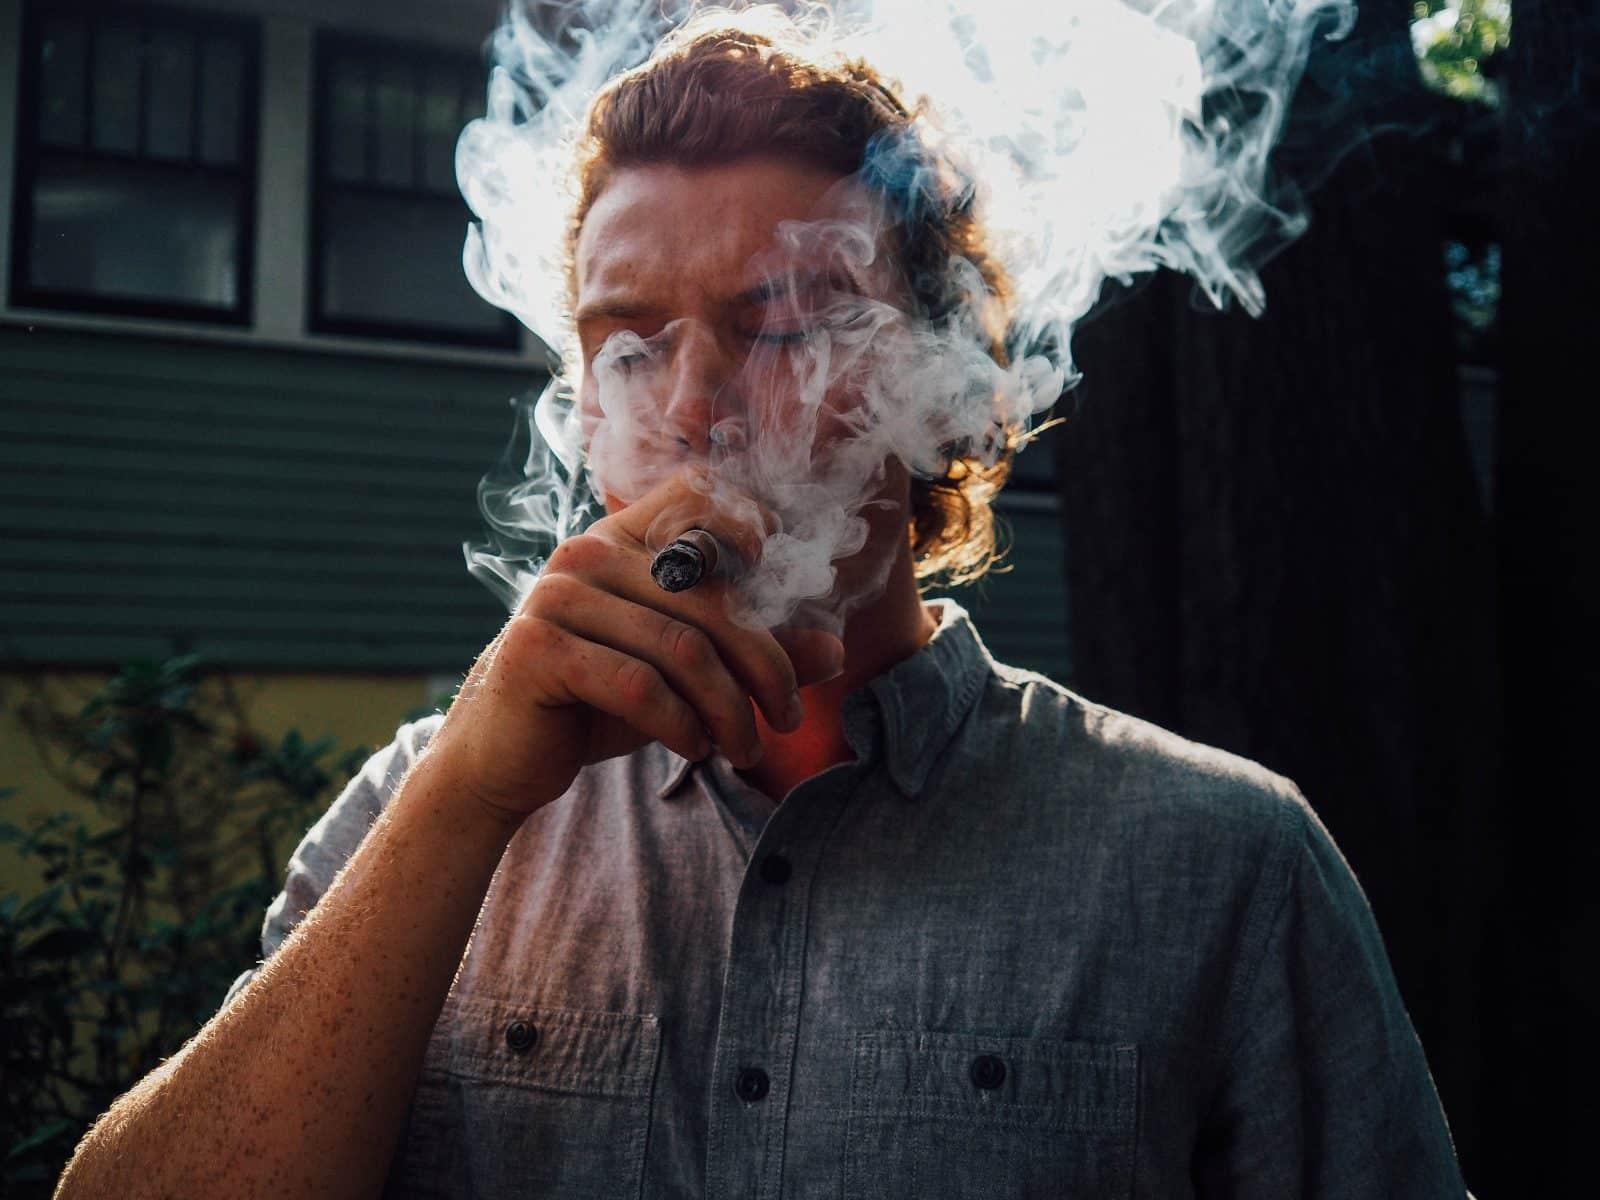 A man enjoying a good cigar